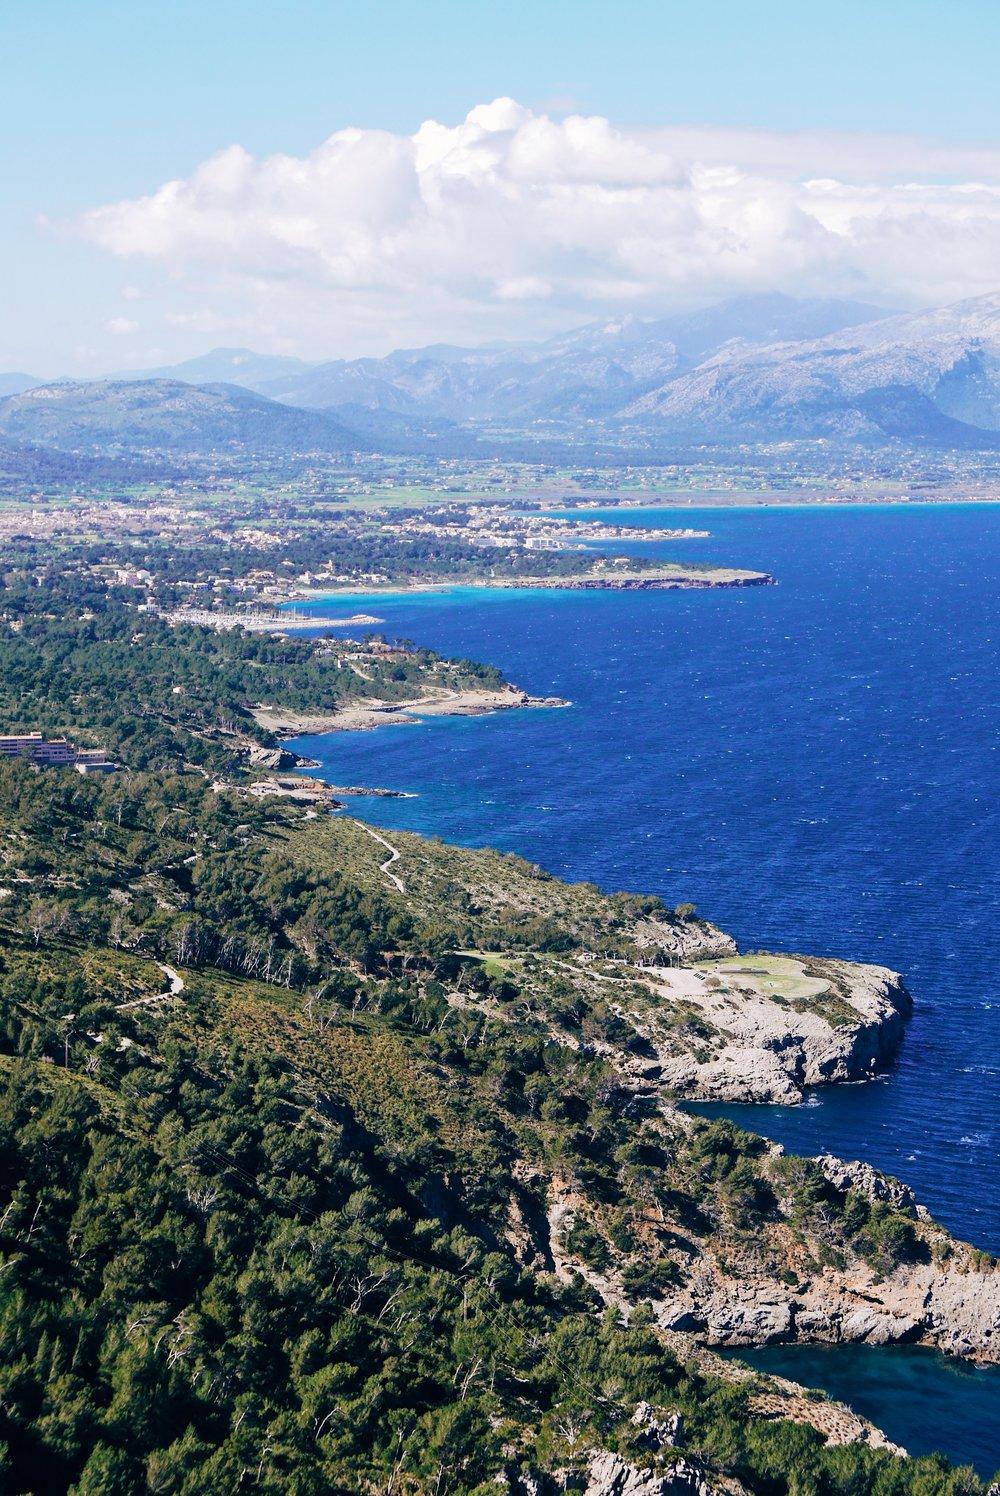 A gorgeous, fictional kingdom set in a Mediterranean paradise. Welcome to Valdoria!